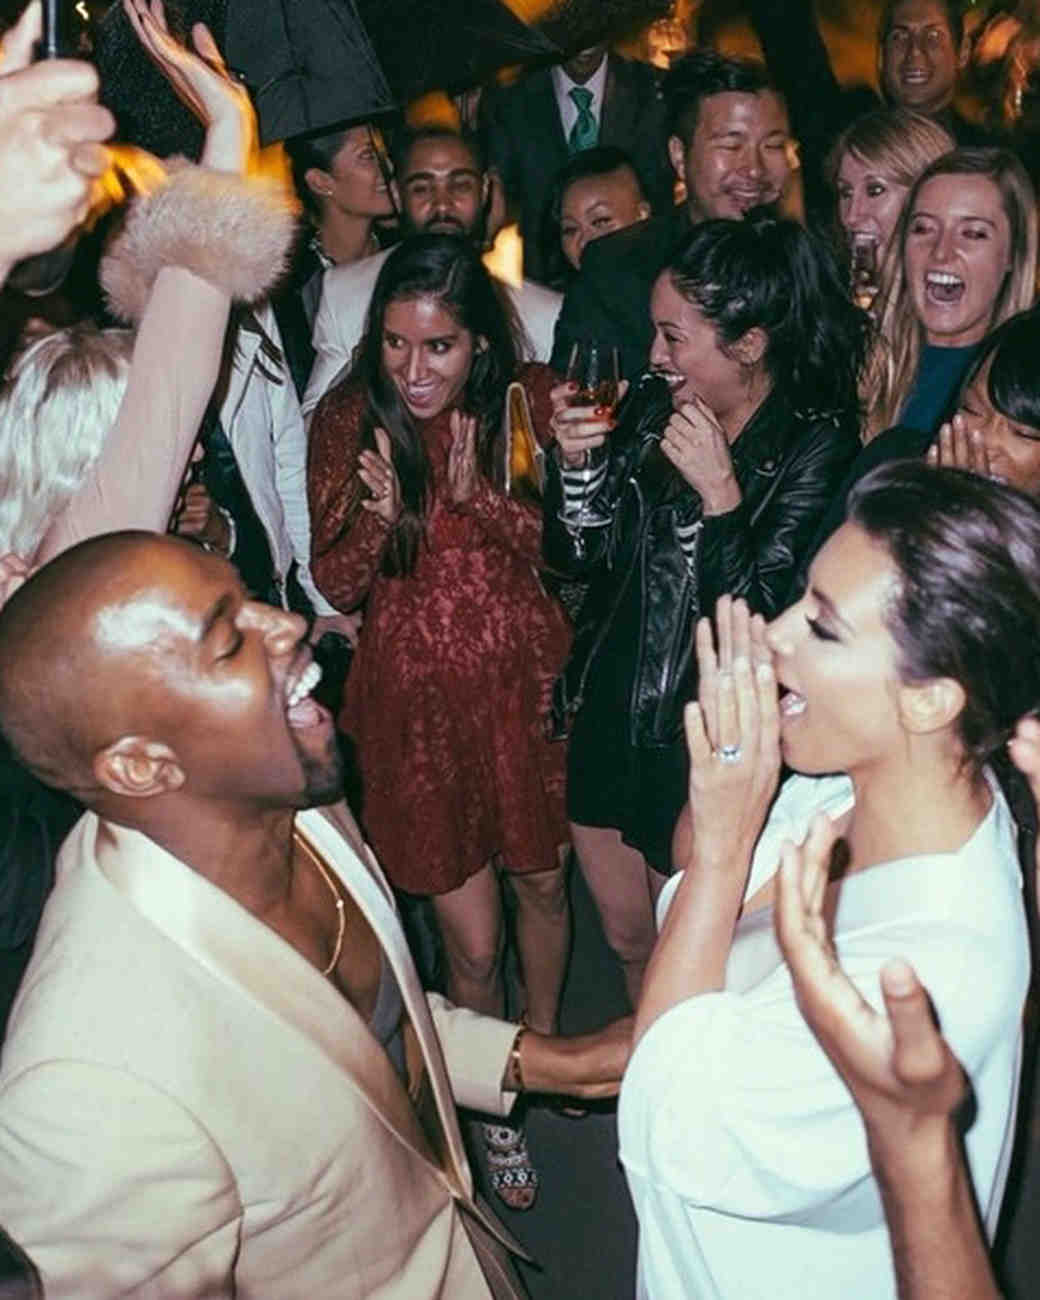 kim-kardashian-kanye-west-rehearsal-dinner-singing-0516.jpg